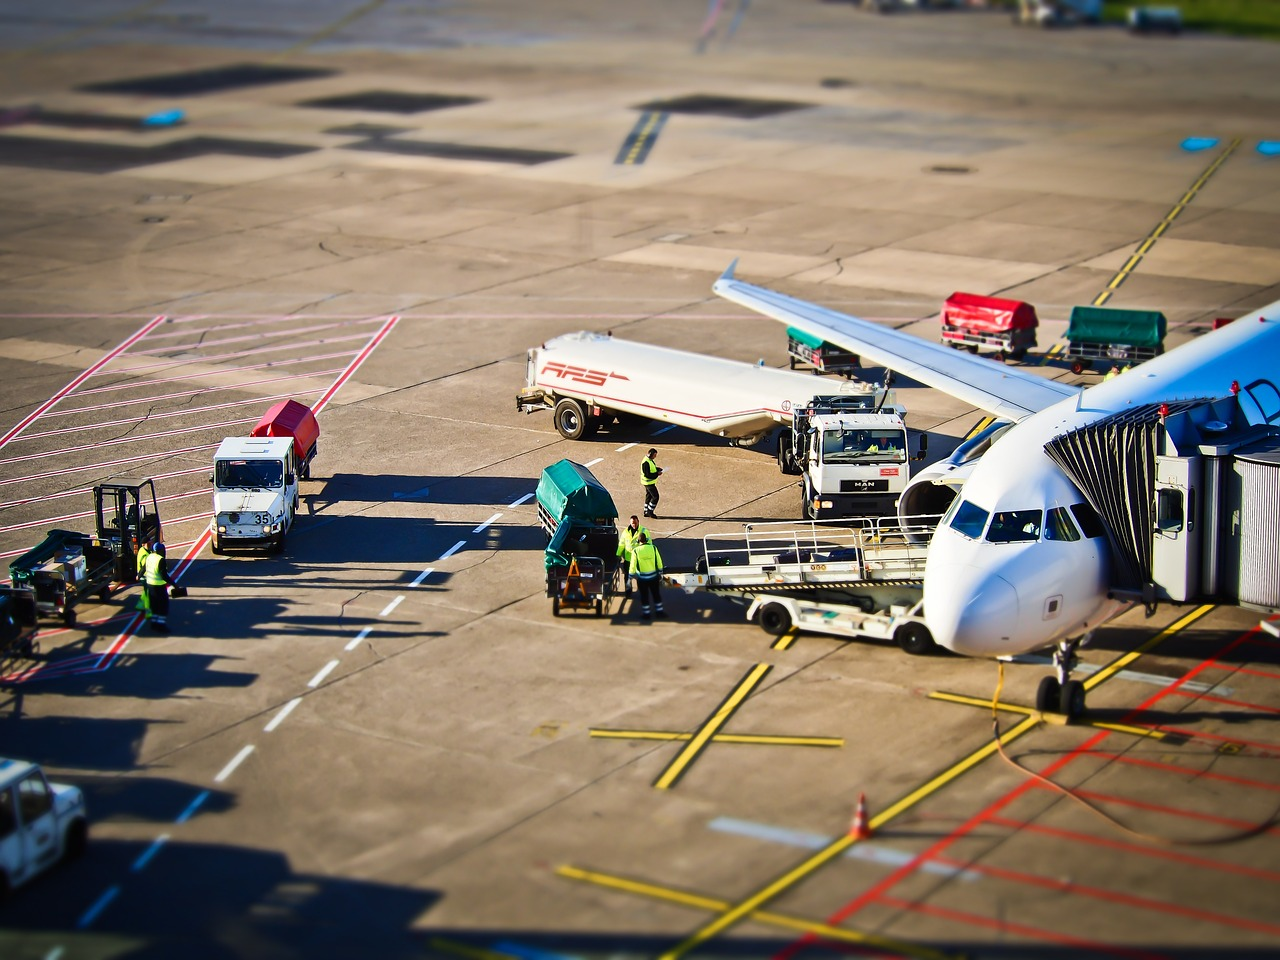 airport-1152251_1280